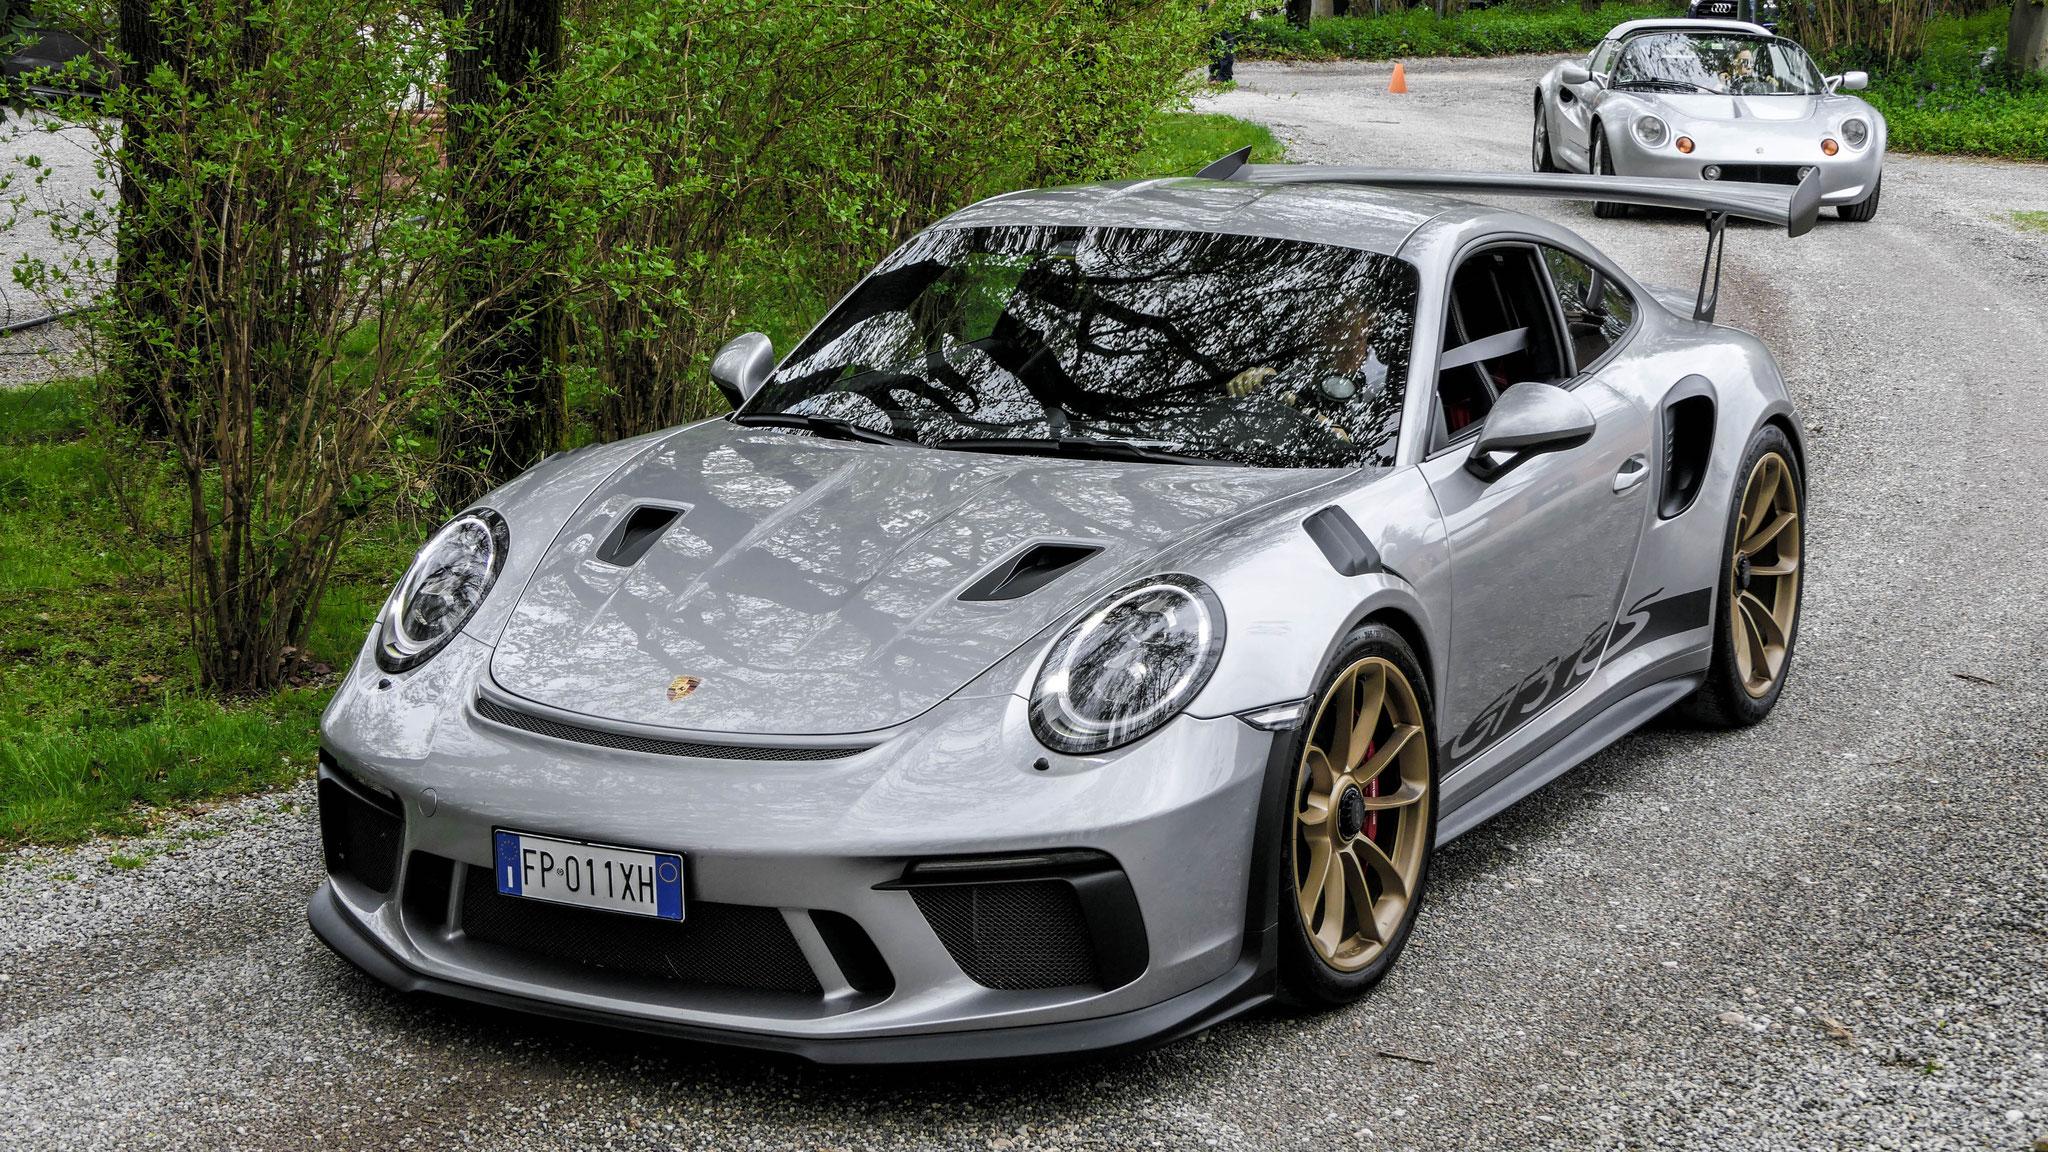 Porsche 911 991.2 GT3 RS - FP-011-XH (ITA)